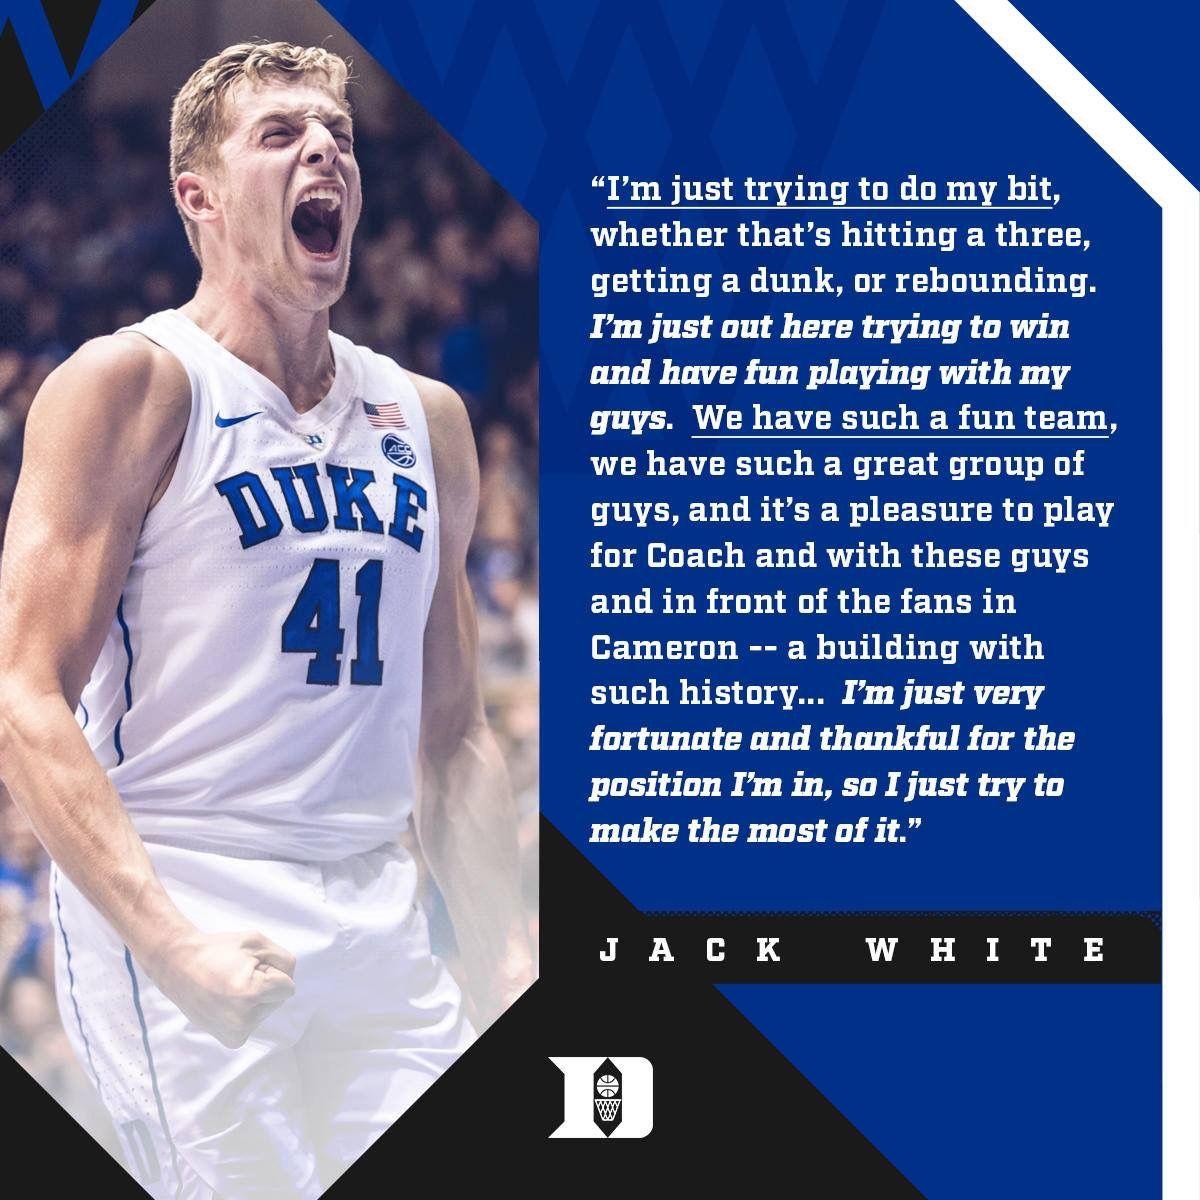 Jack White Duke Basketball 🏀 Basketball game tickets